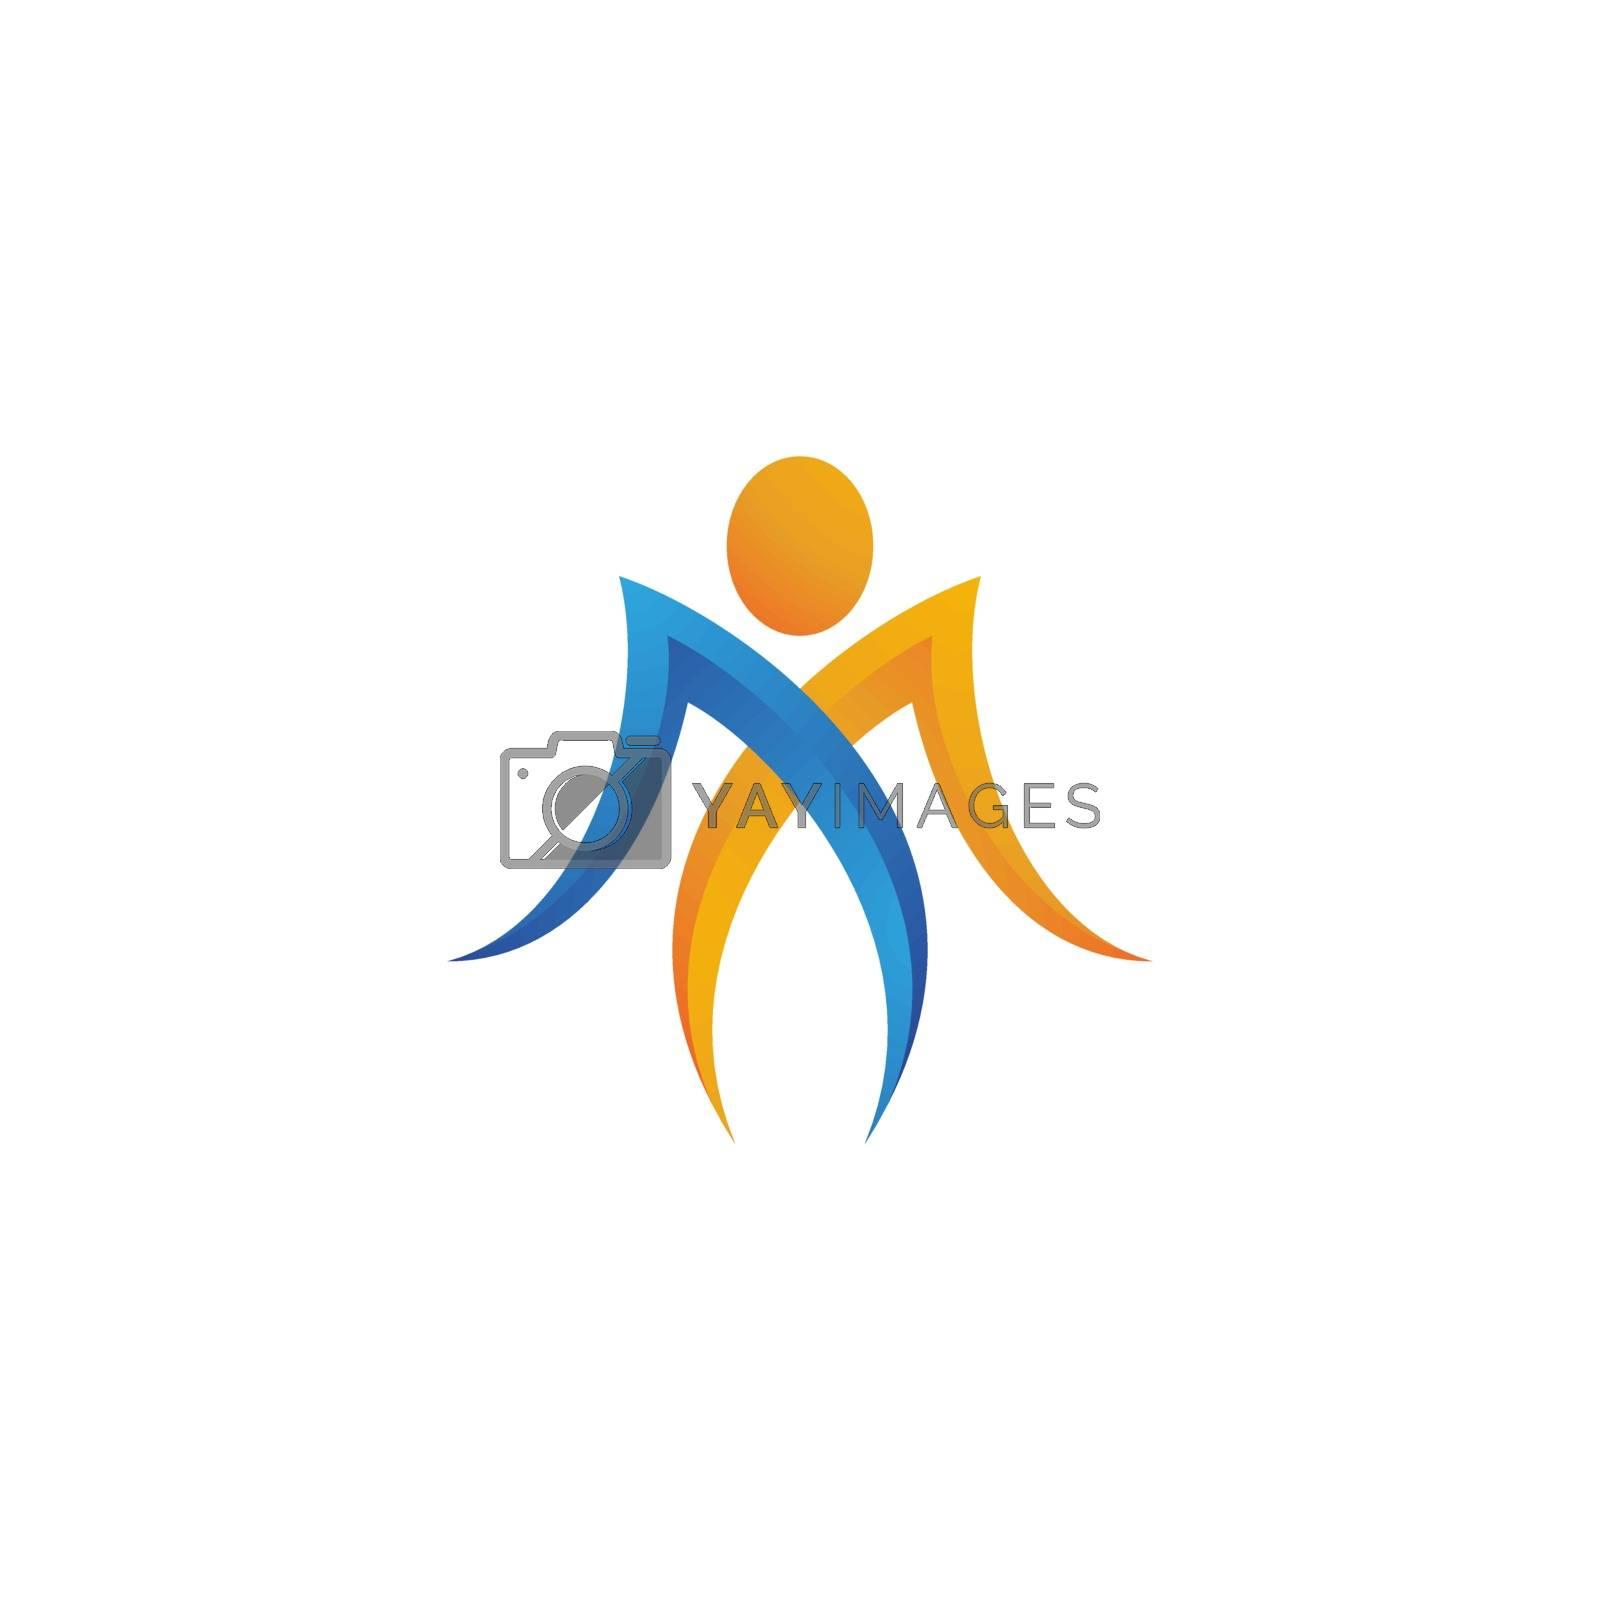 Human character logo sign illustration vector design